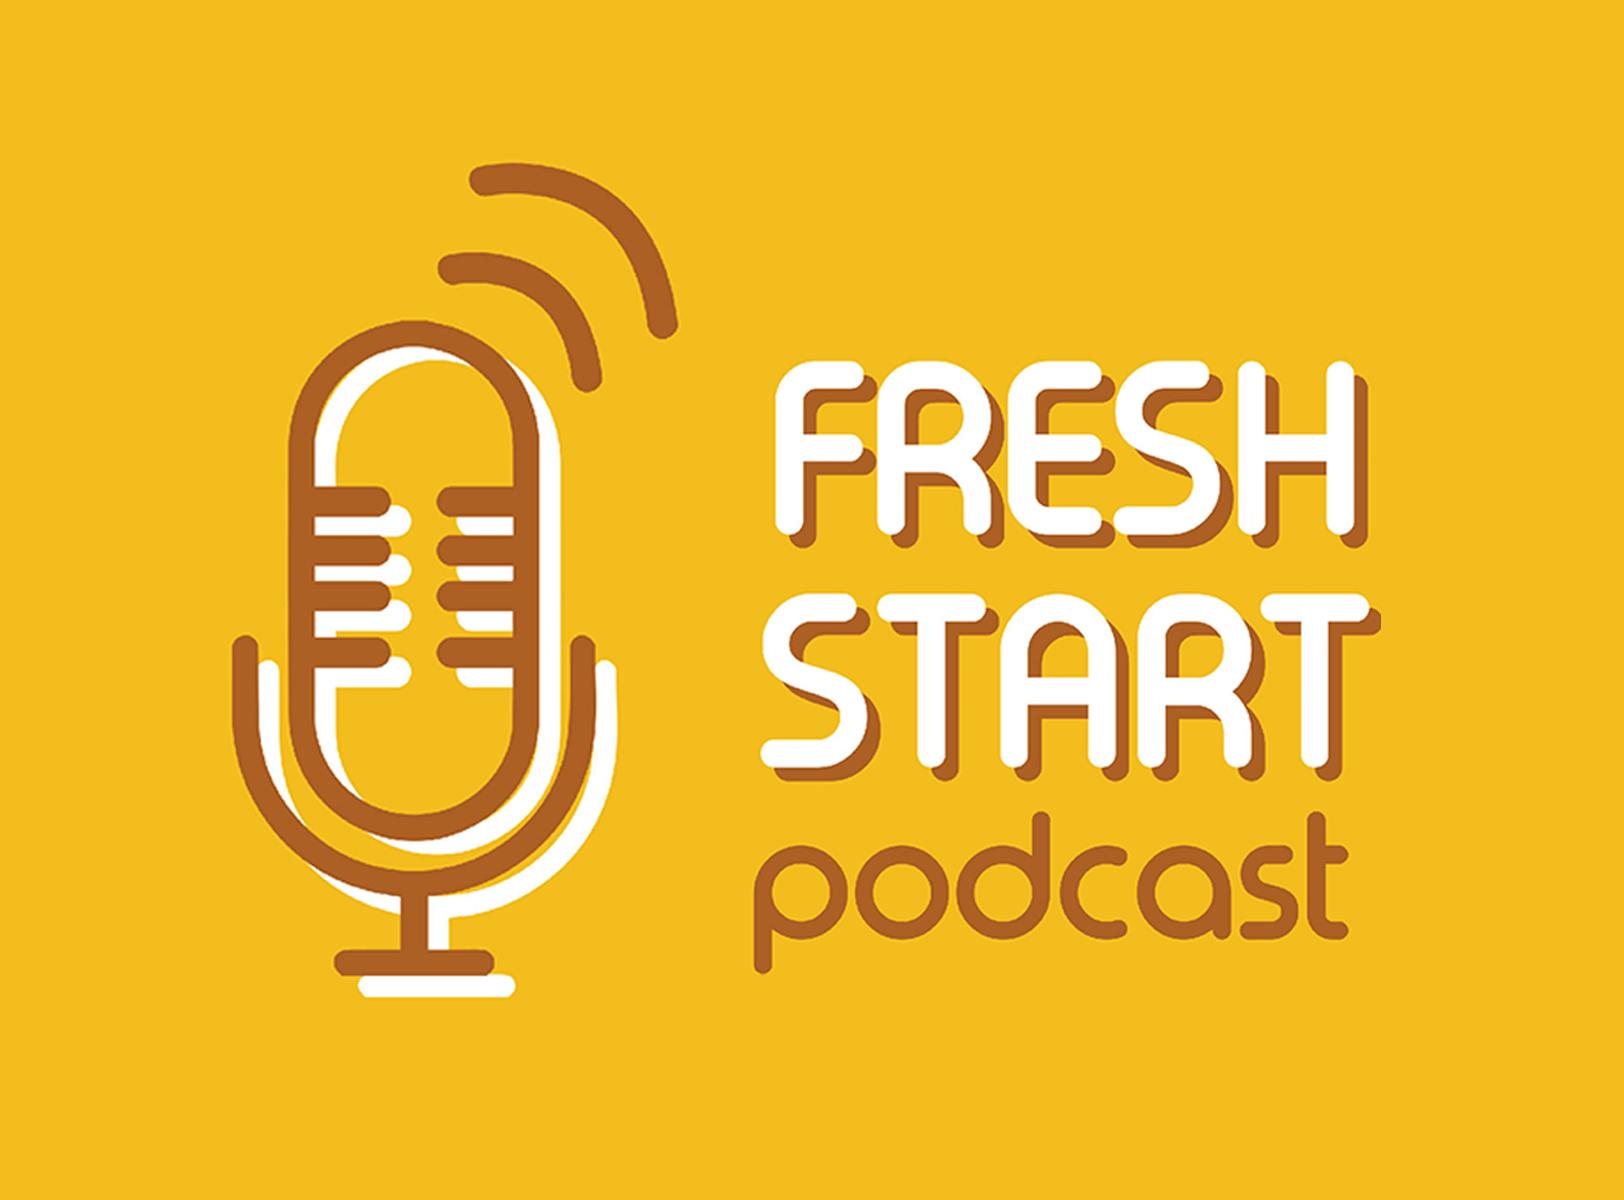 Fresh Start: Podcast News (4/14/2019 Sun.)